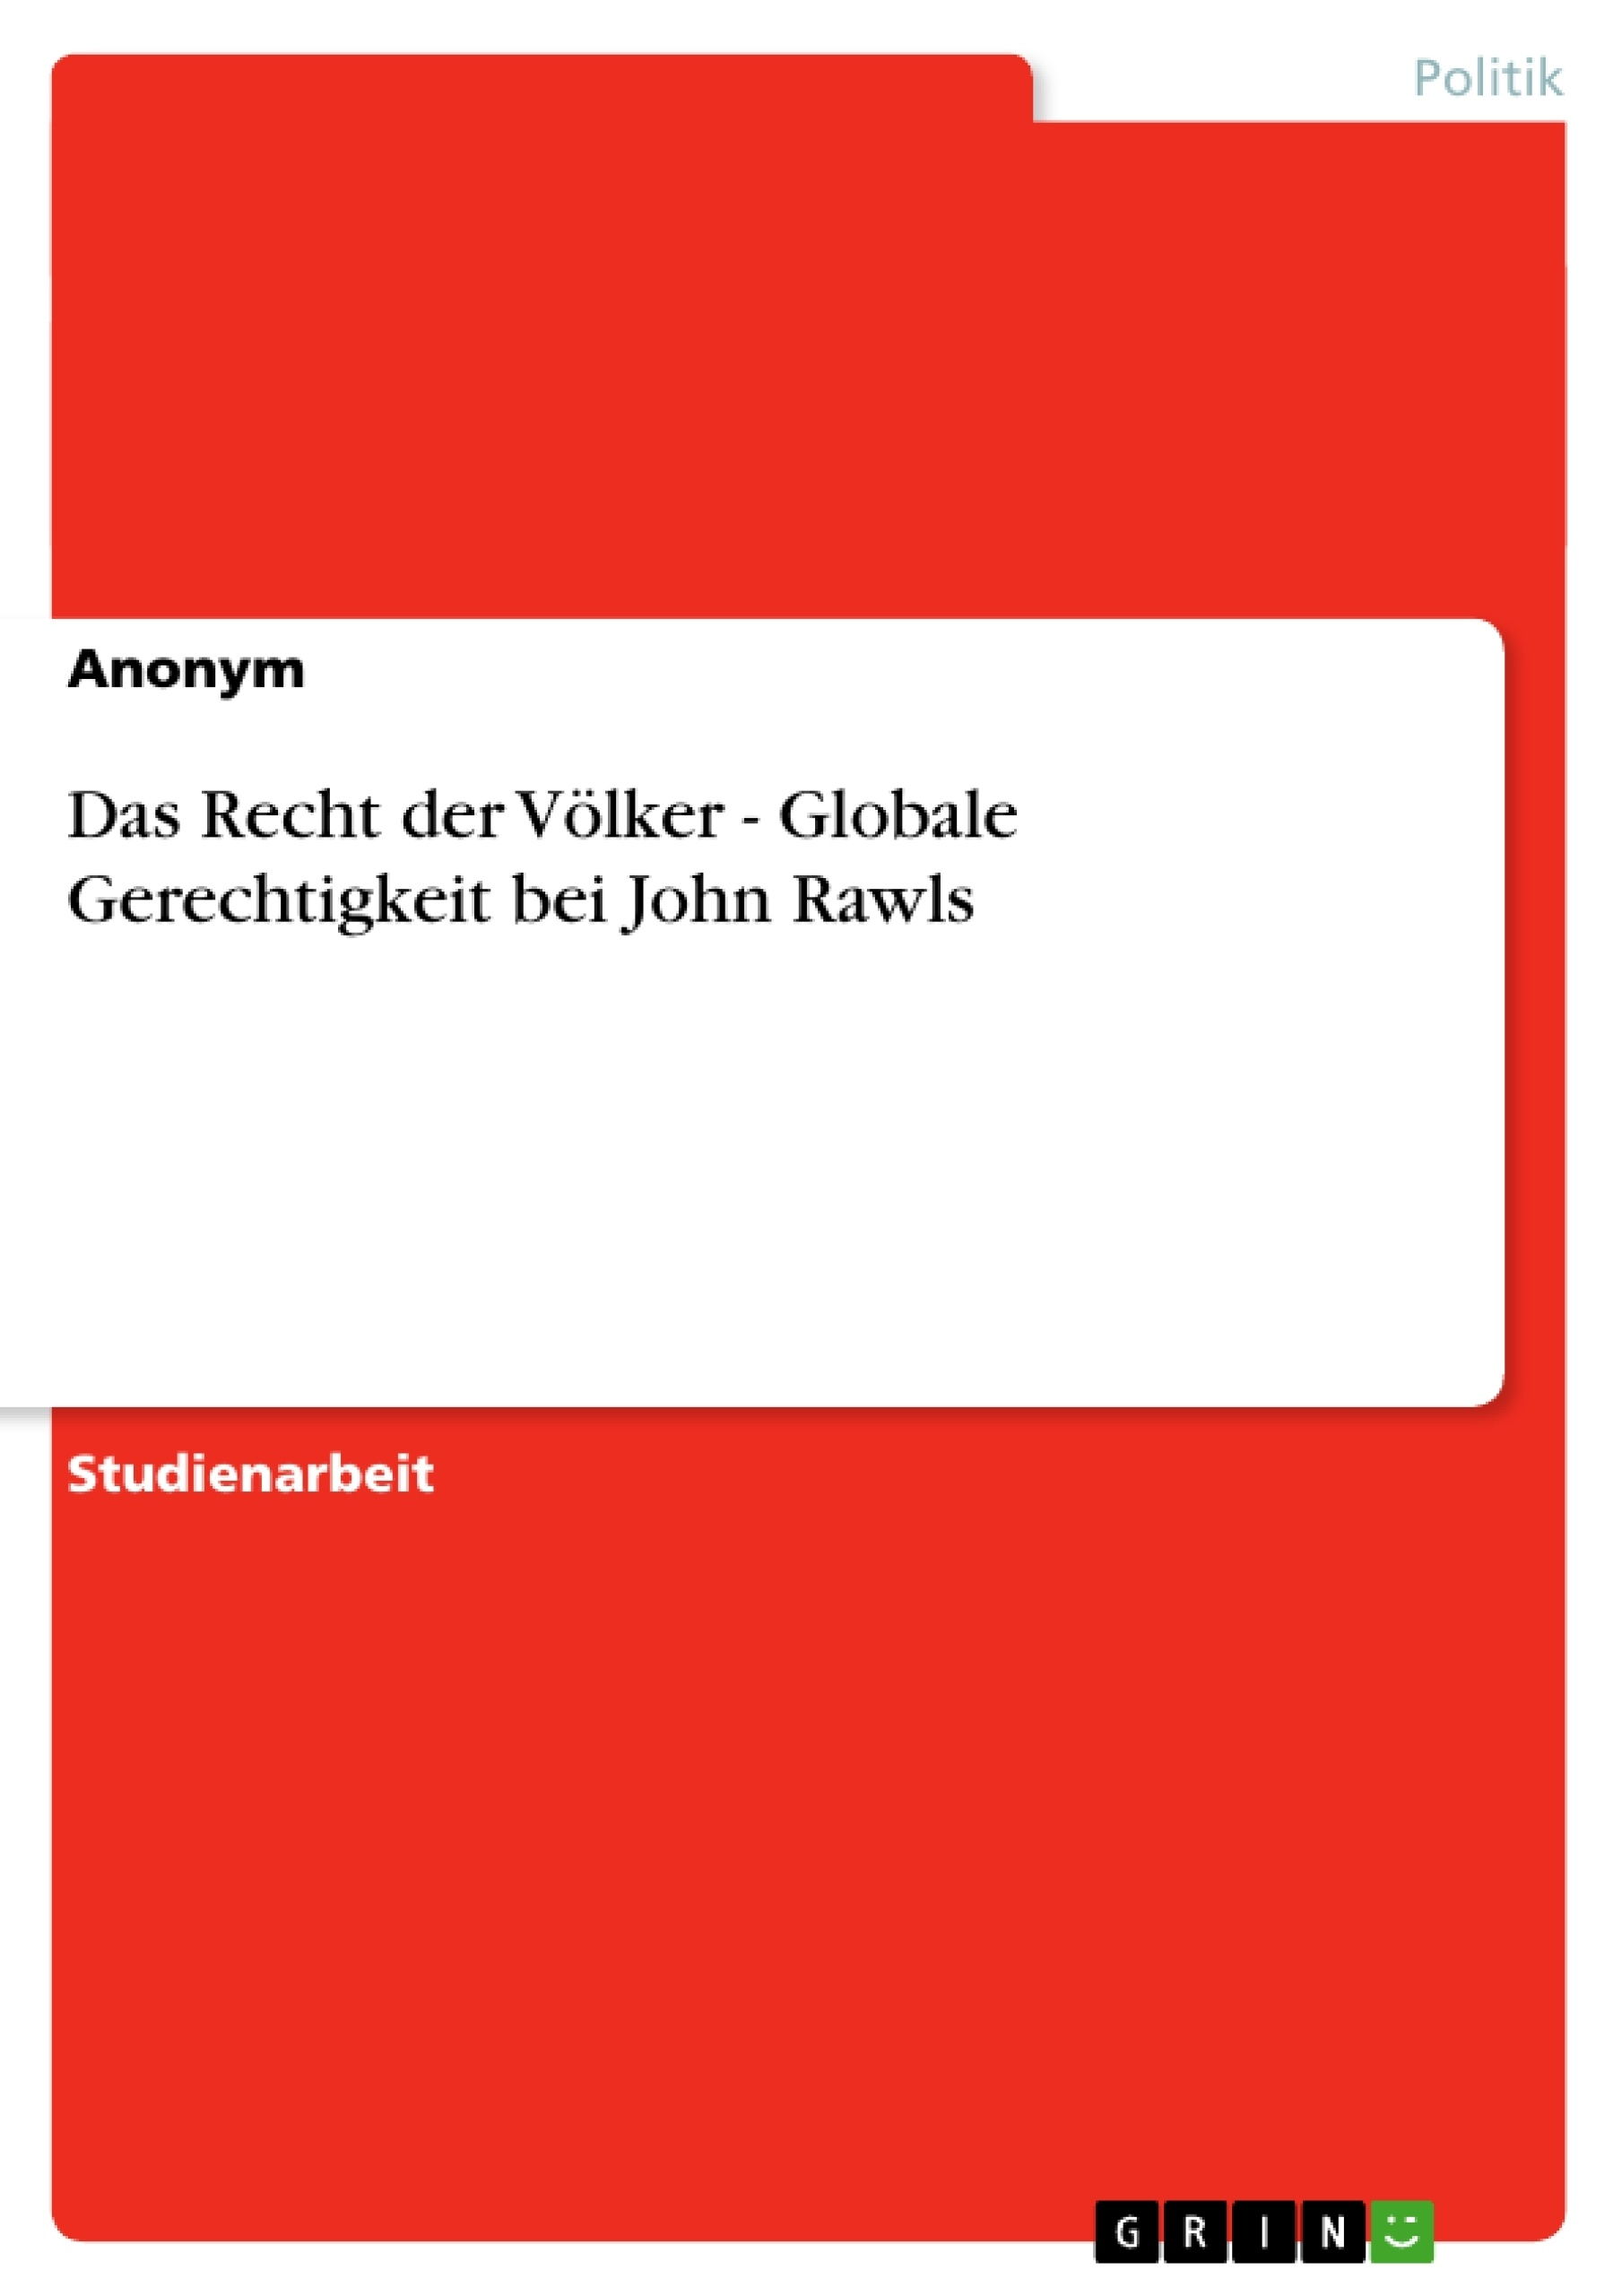 Titel: Das Recht der Völker - Globale Gerechtigkeit bei John Rawls